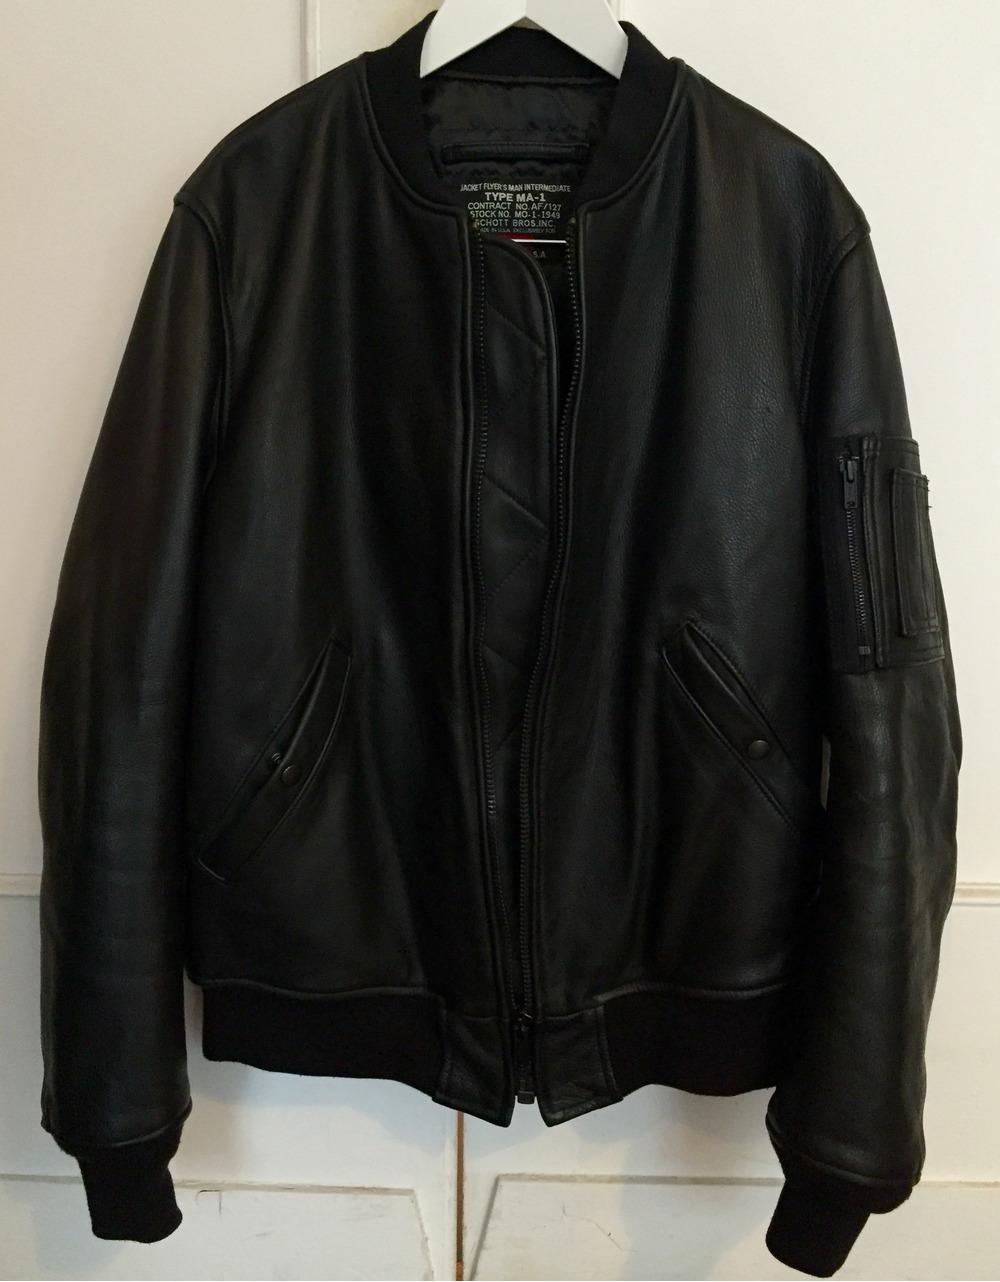 supreme x schott nyc leather ma 1 bomber jacket 484388 from d10s at klekt. Black Bedroom Furniture Sets. Home Design Ideas